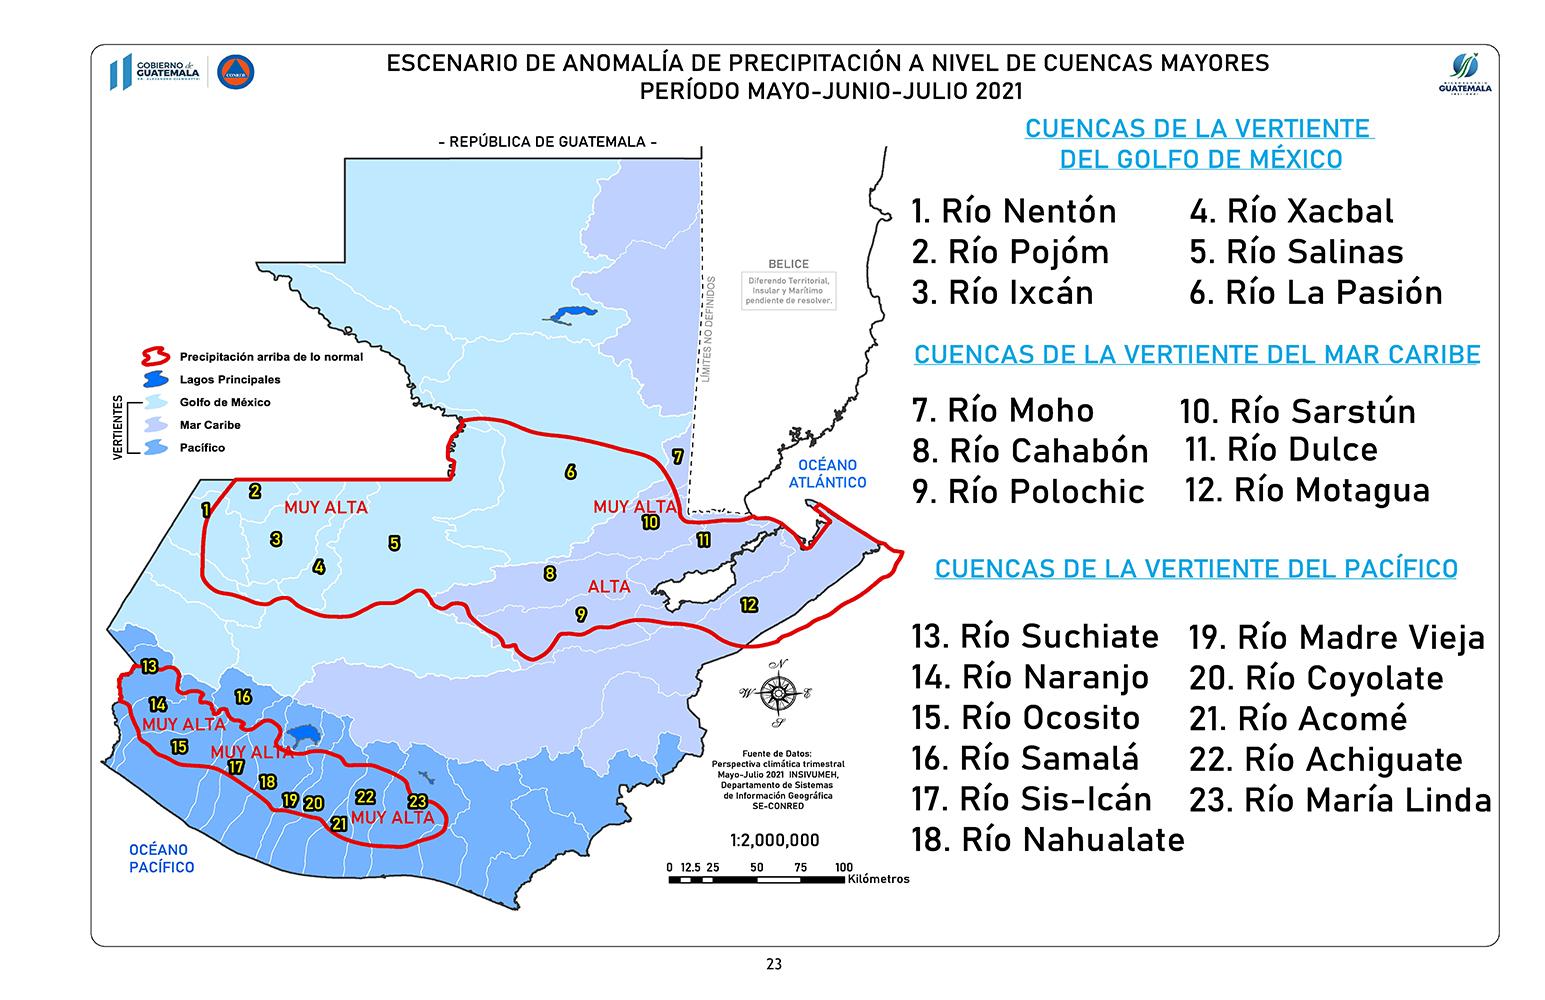 Imagen ilustrativa temporada de lluvias en Guatemala